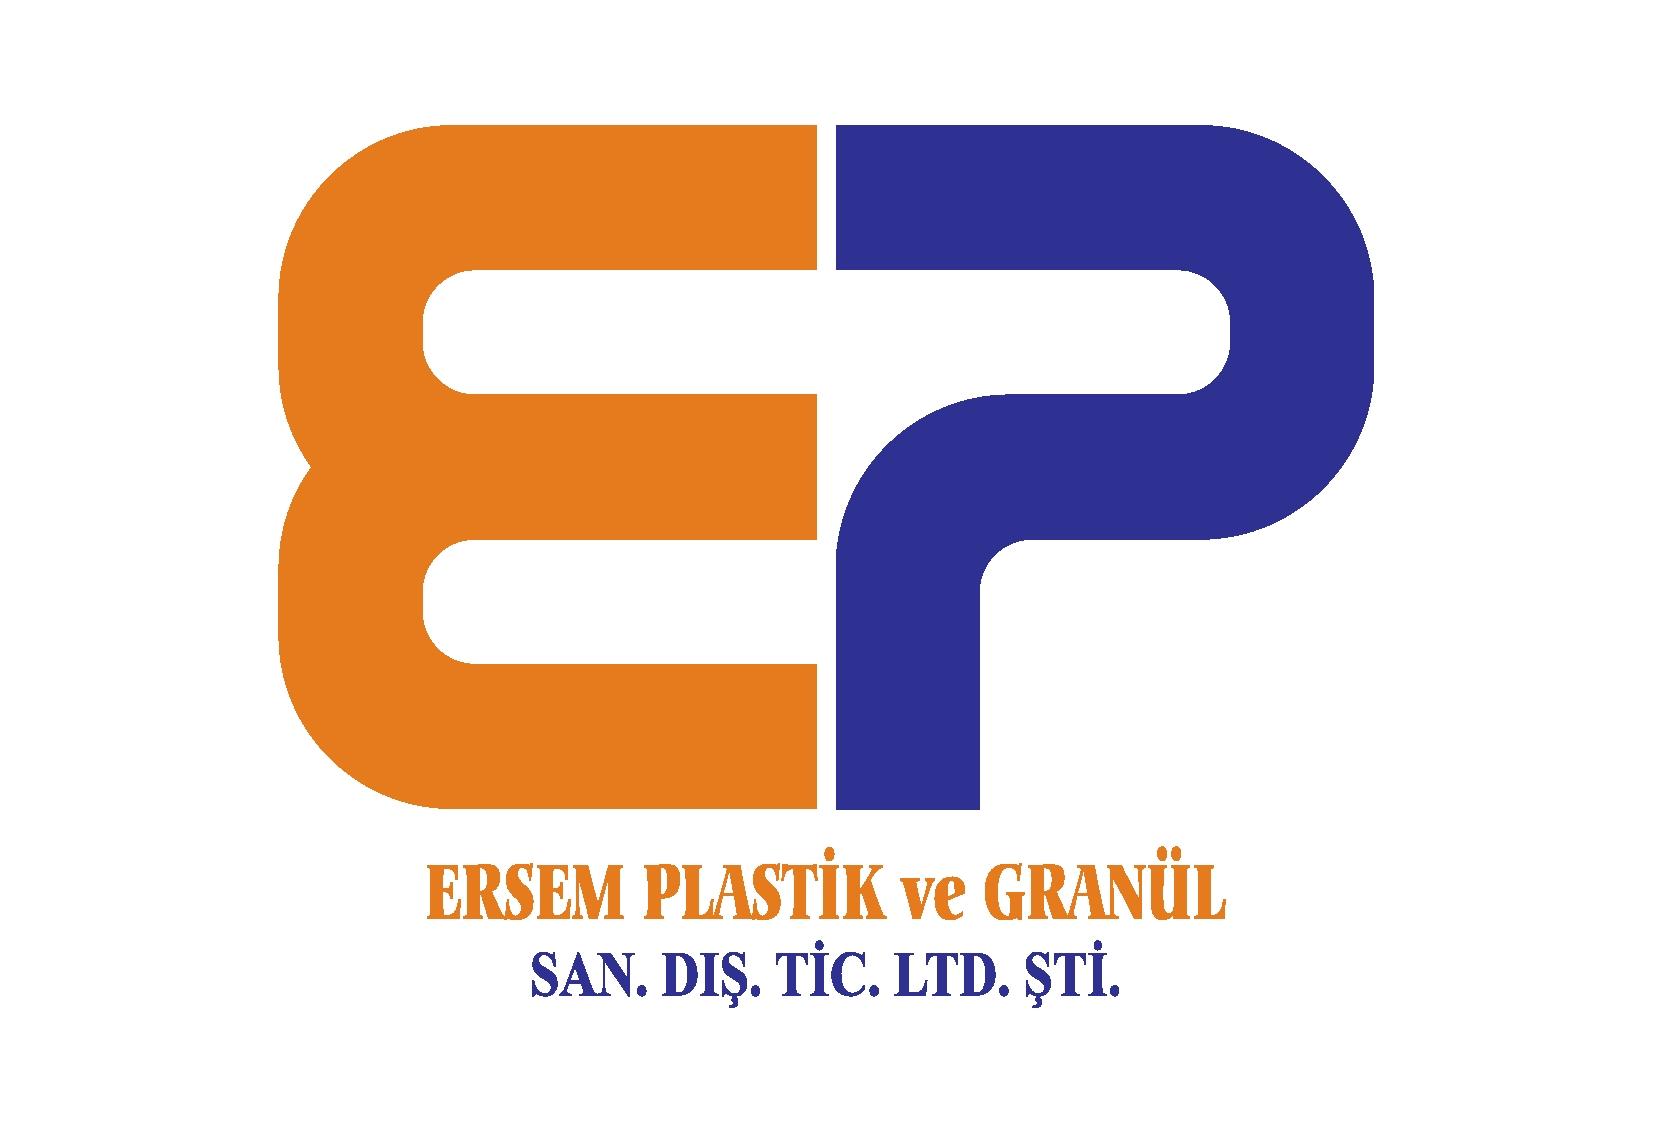 ersem plastik logo-2.jpg